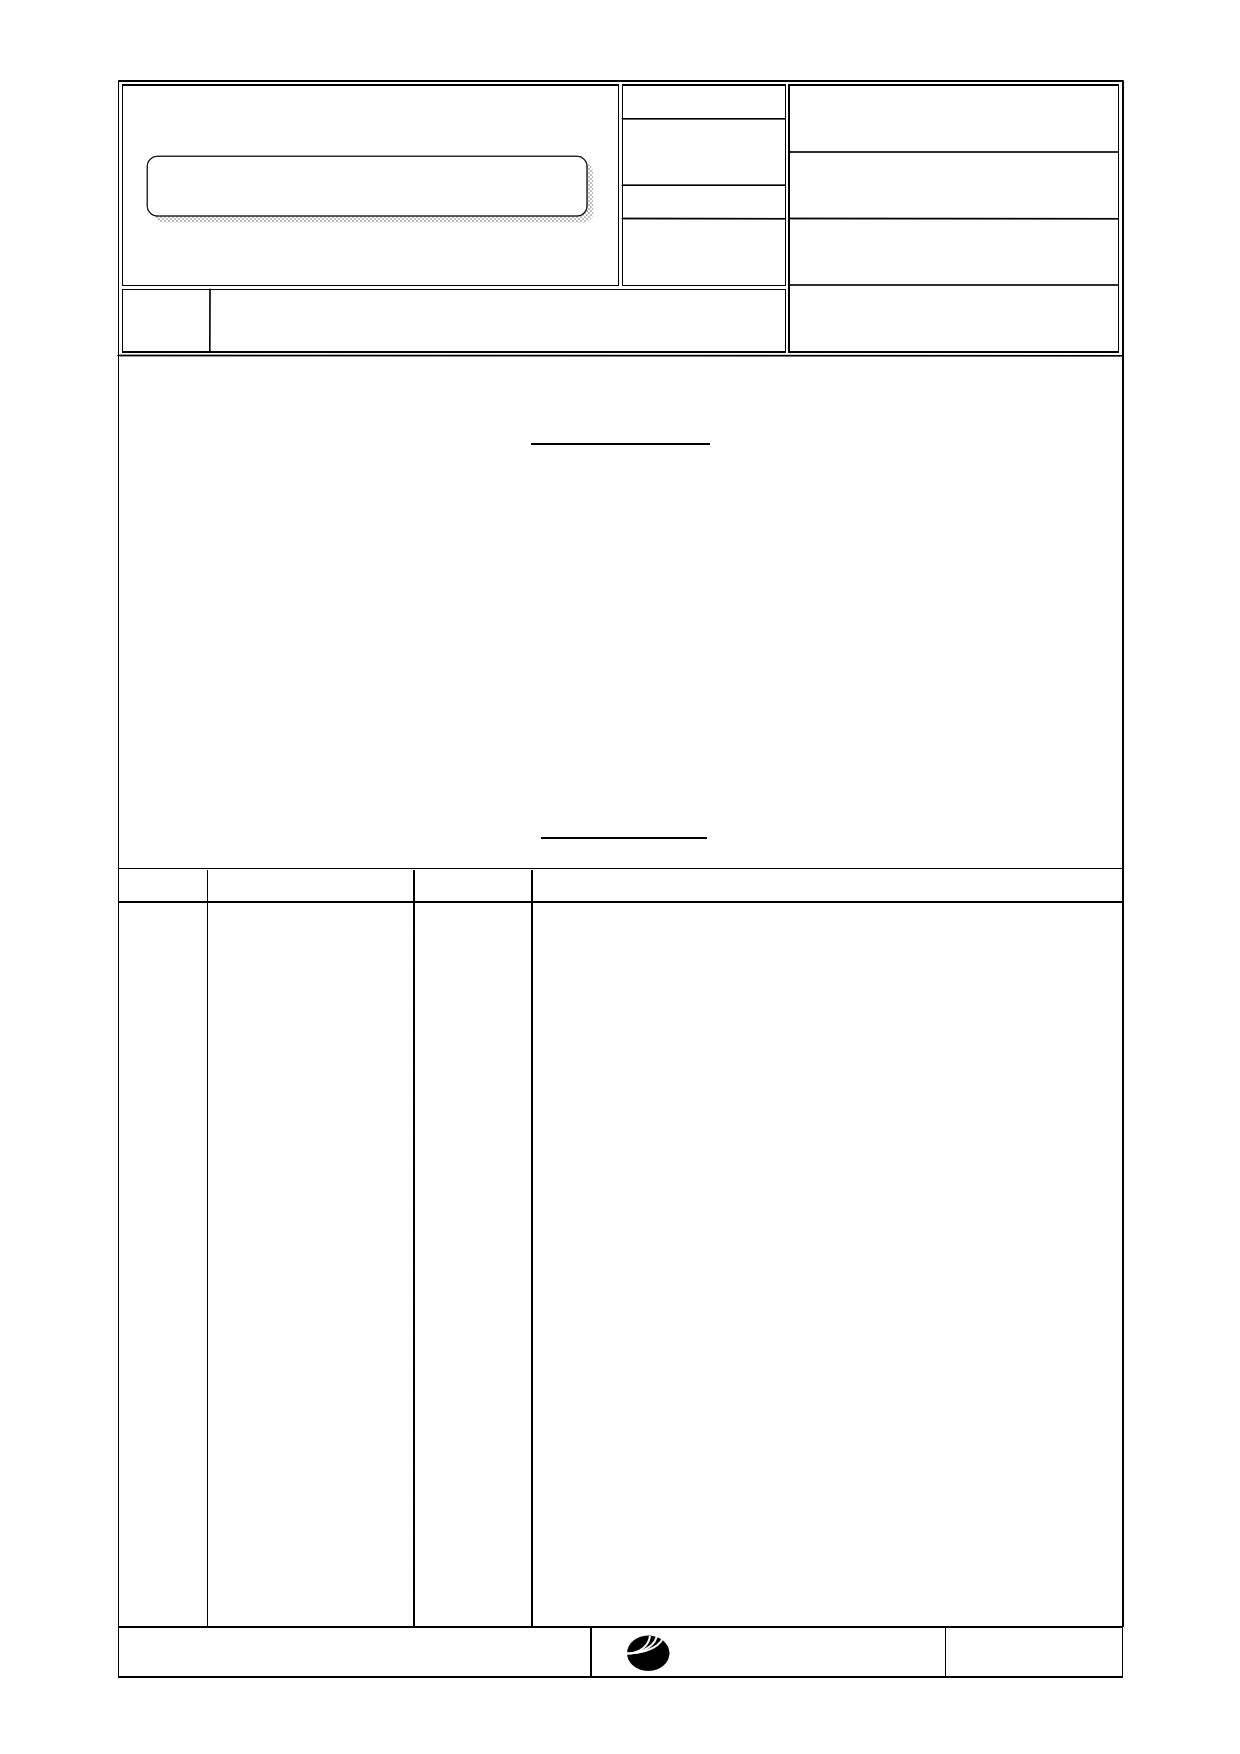 DMC20261NYJ-LY-BCE datasheet